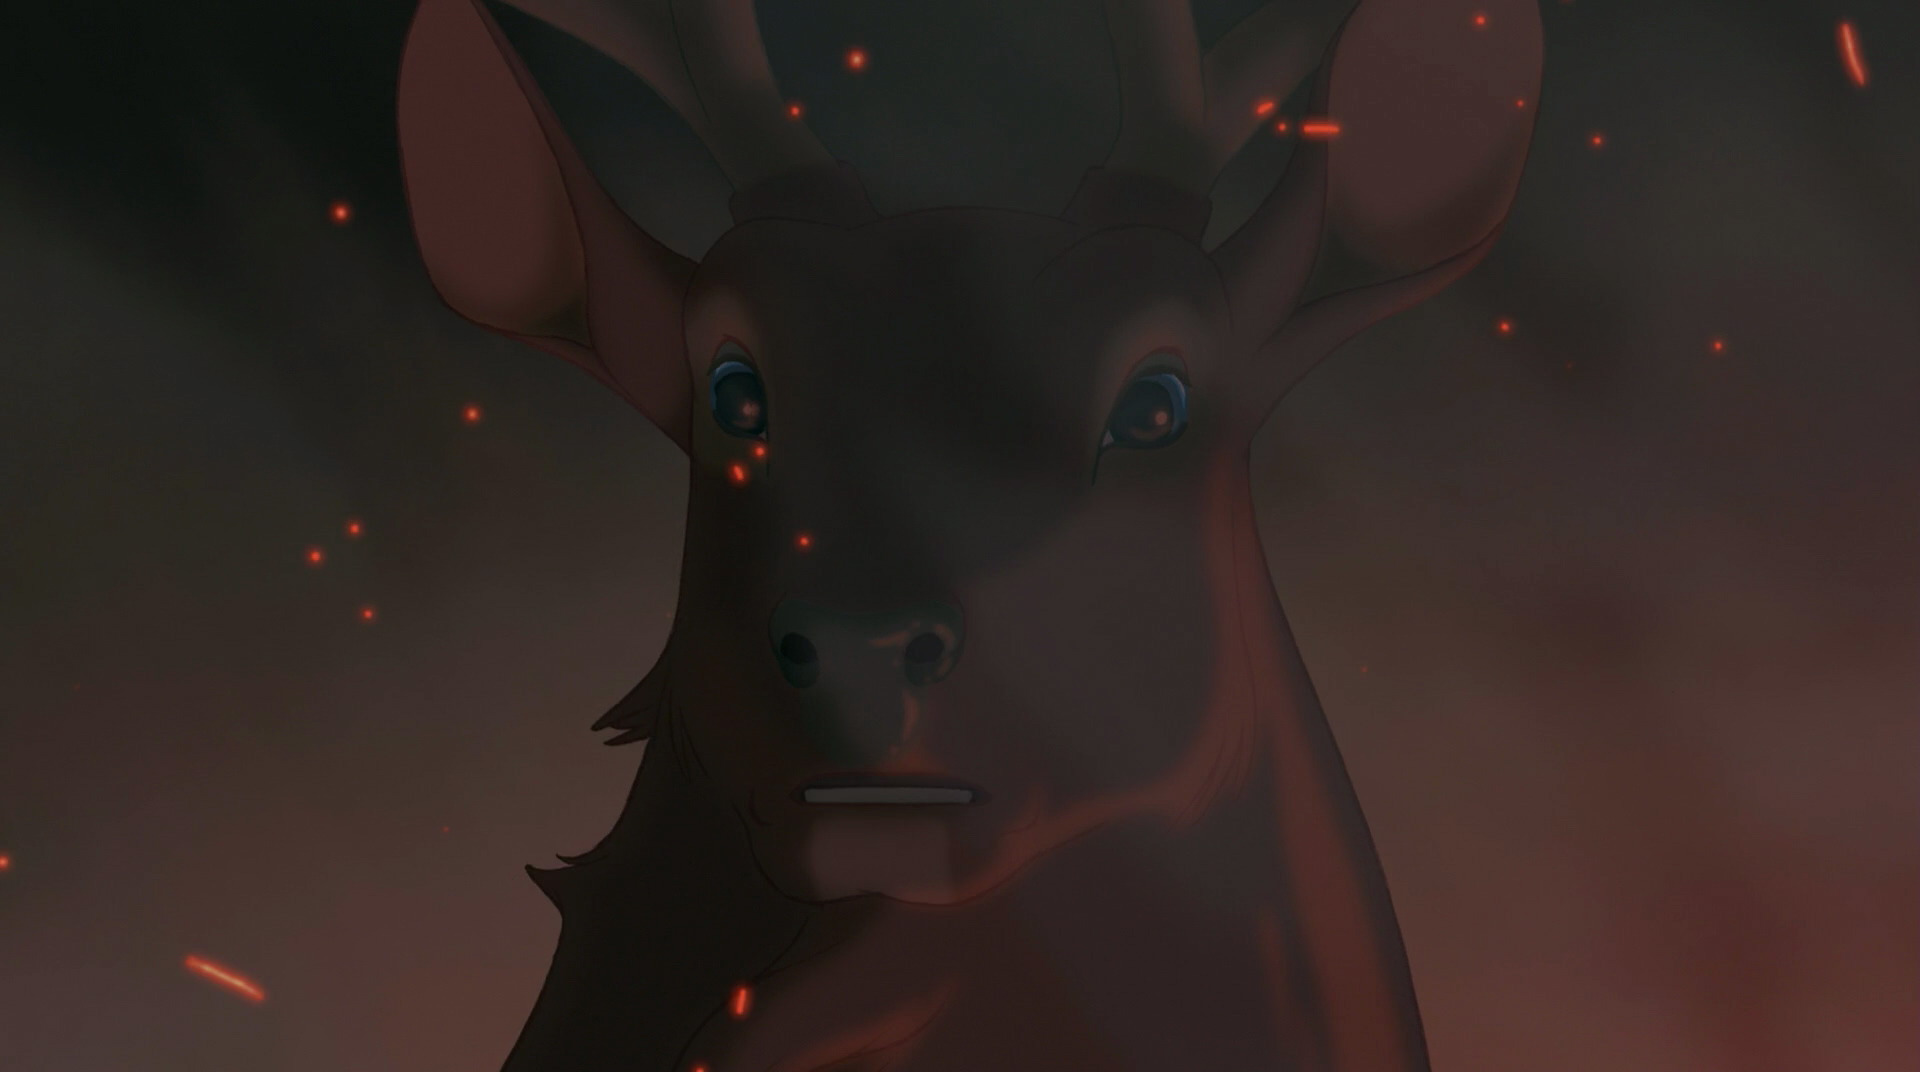 Image - Fantasia-disneyscreencaps com-7528.jpg - DisneyWiki